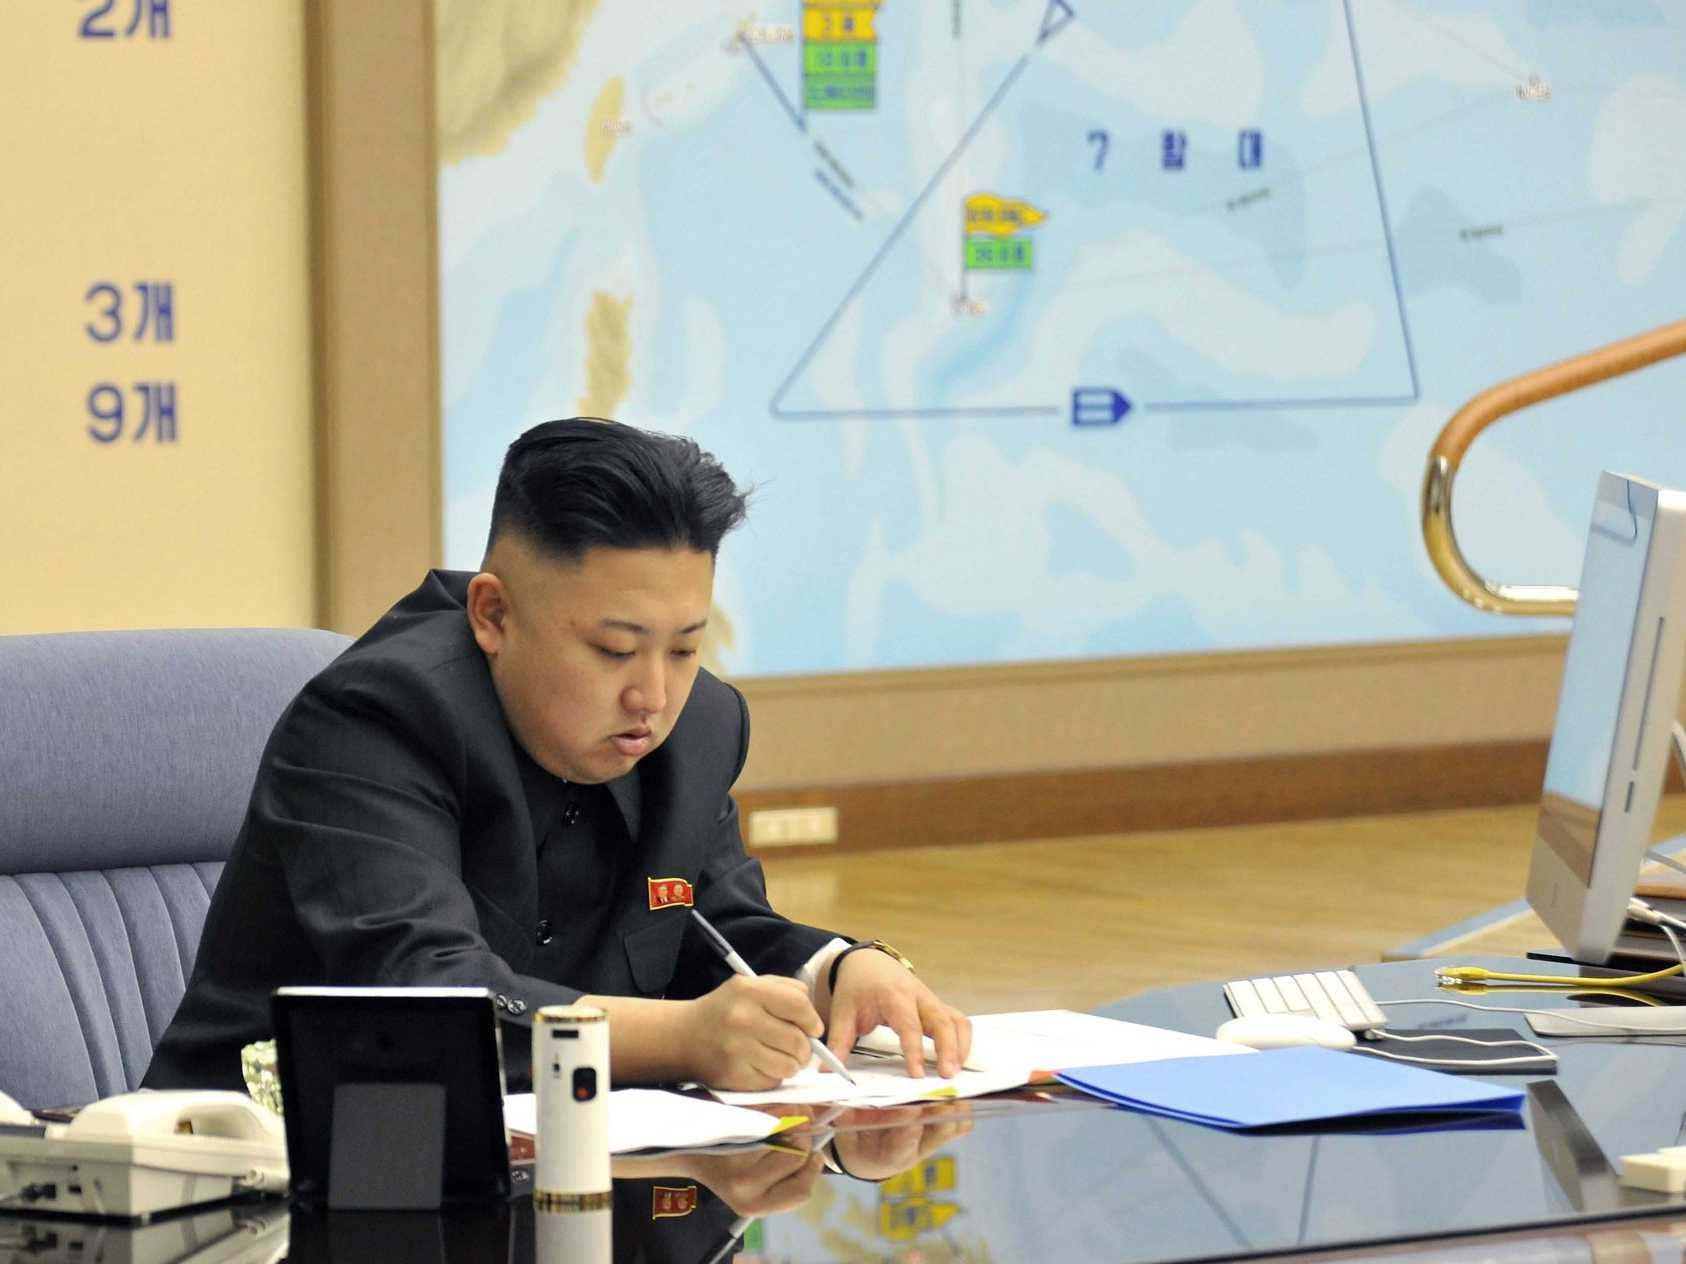 kim-jong-un-attack-plan-us-1.jpg